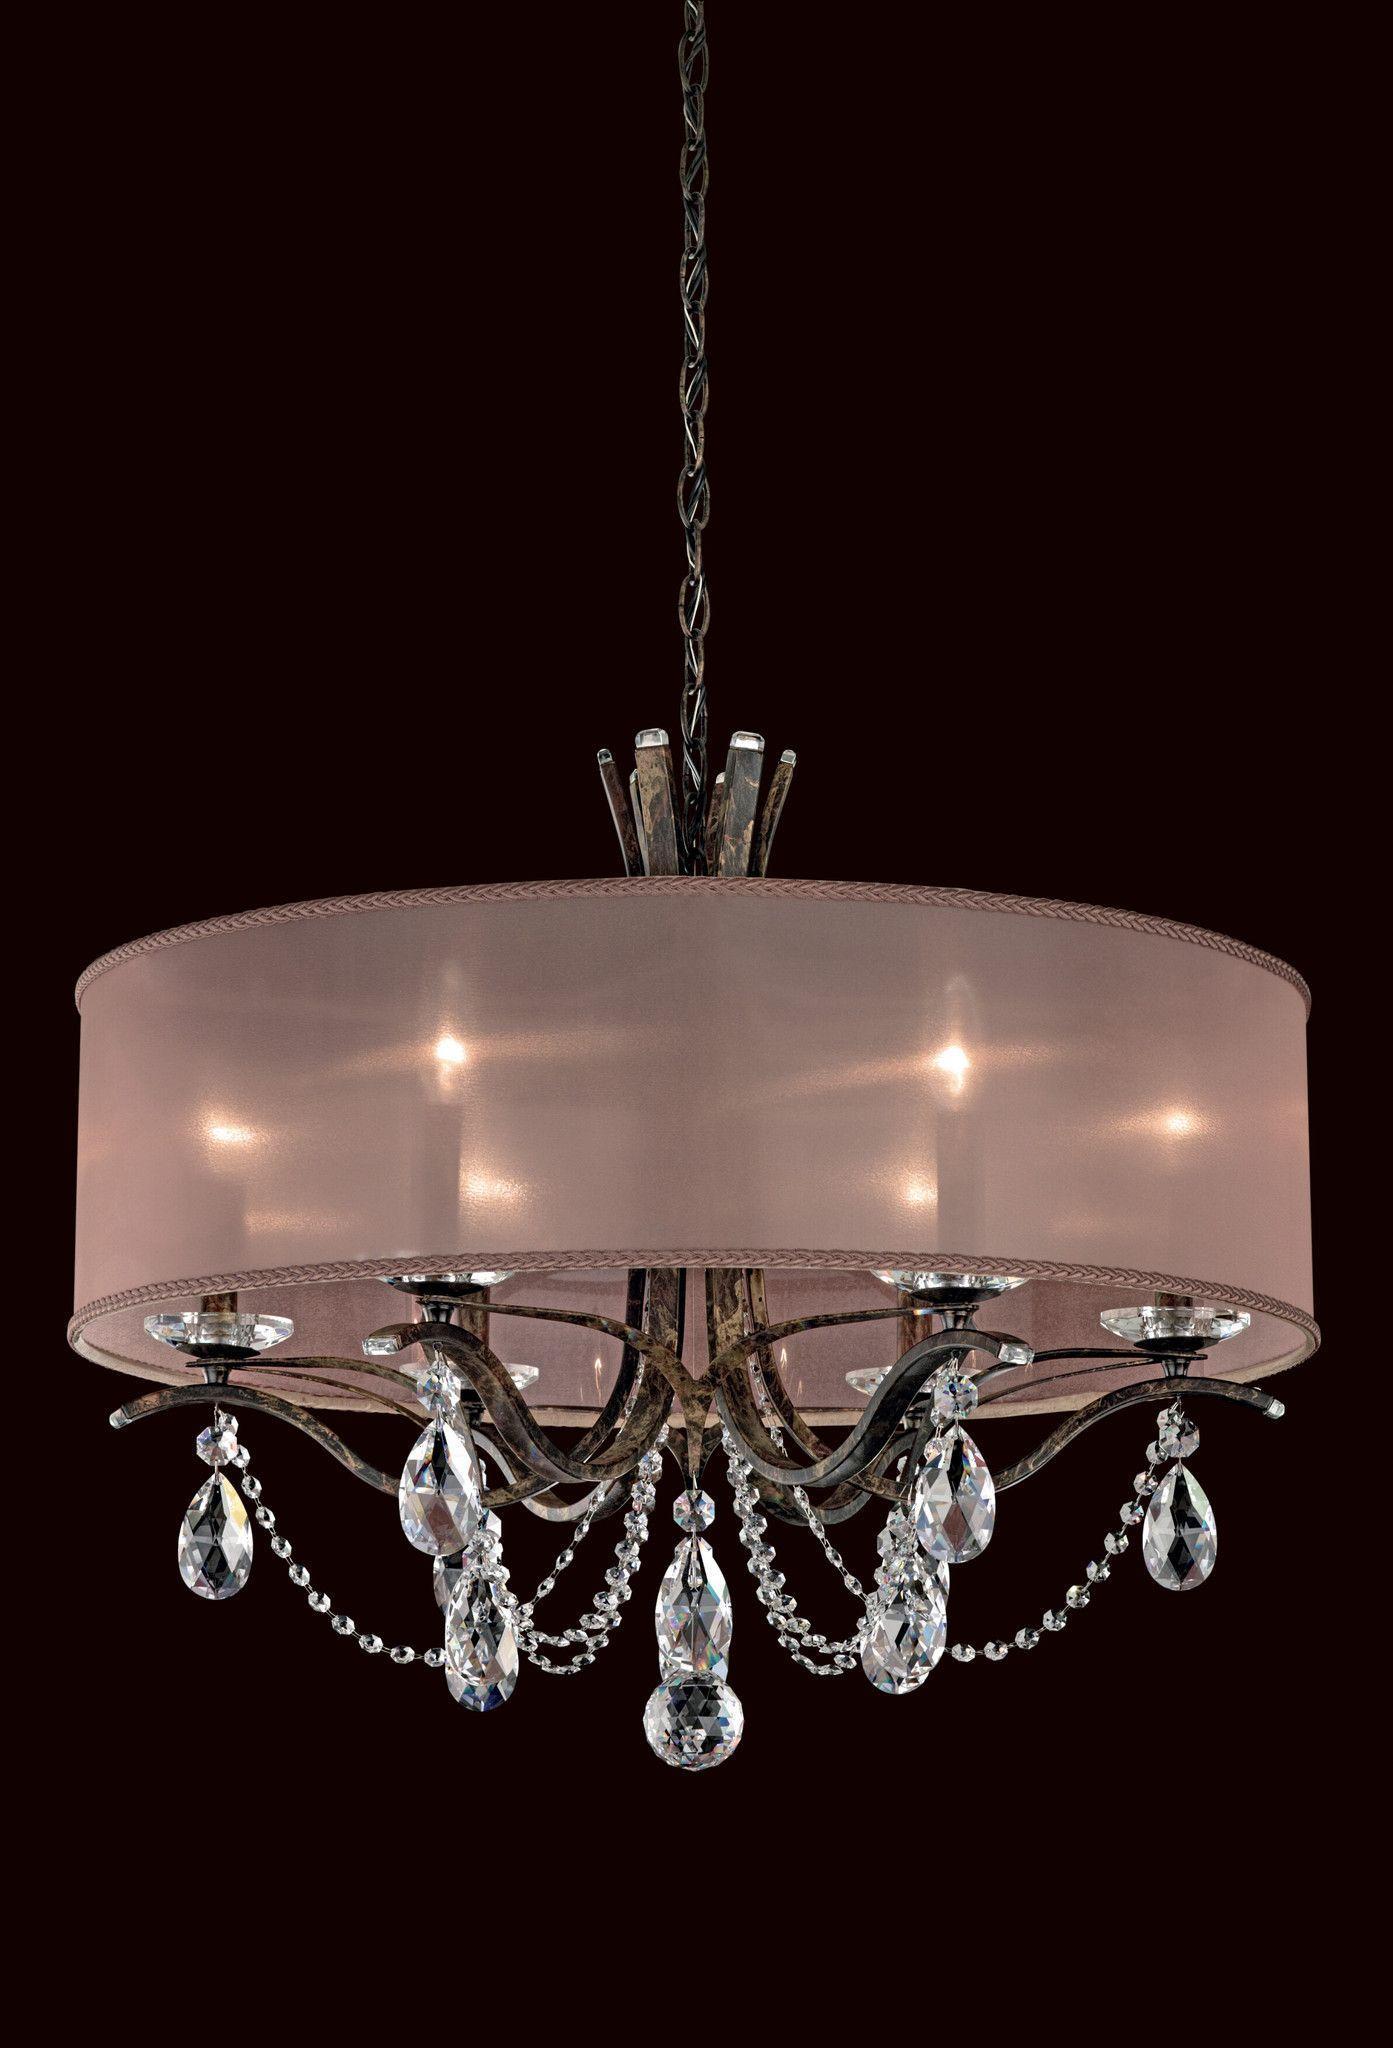 The Schonbek Vesca is a crystal chandelier